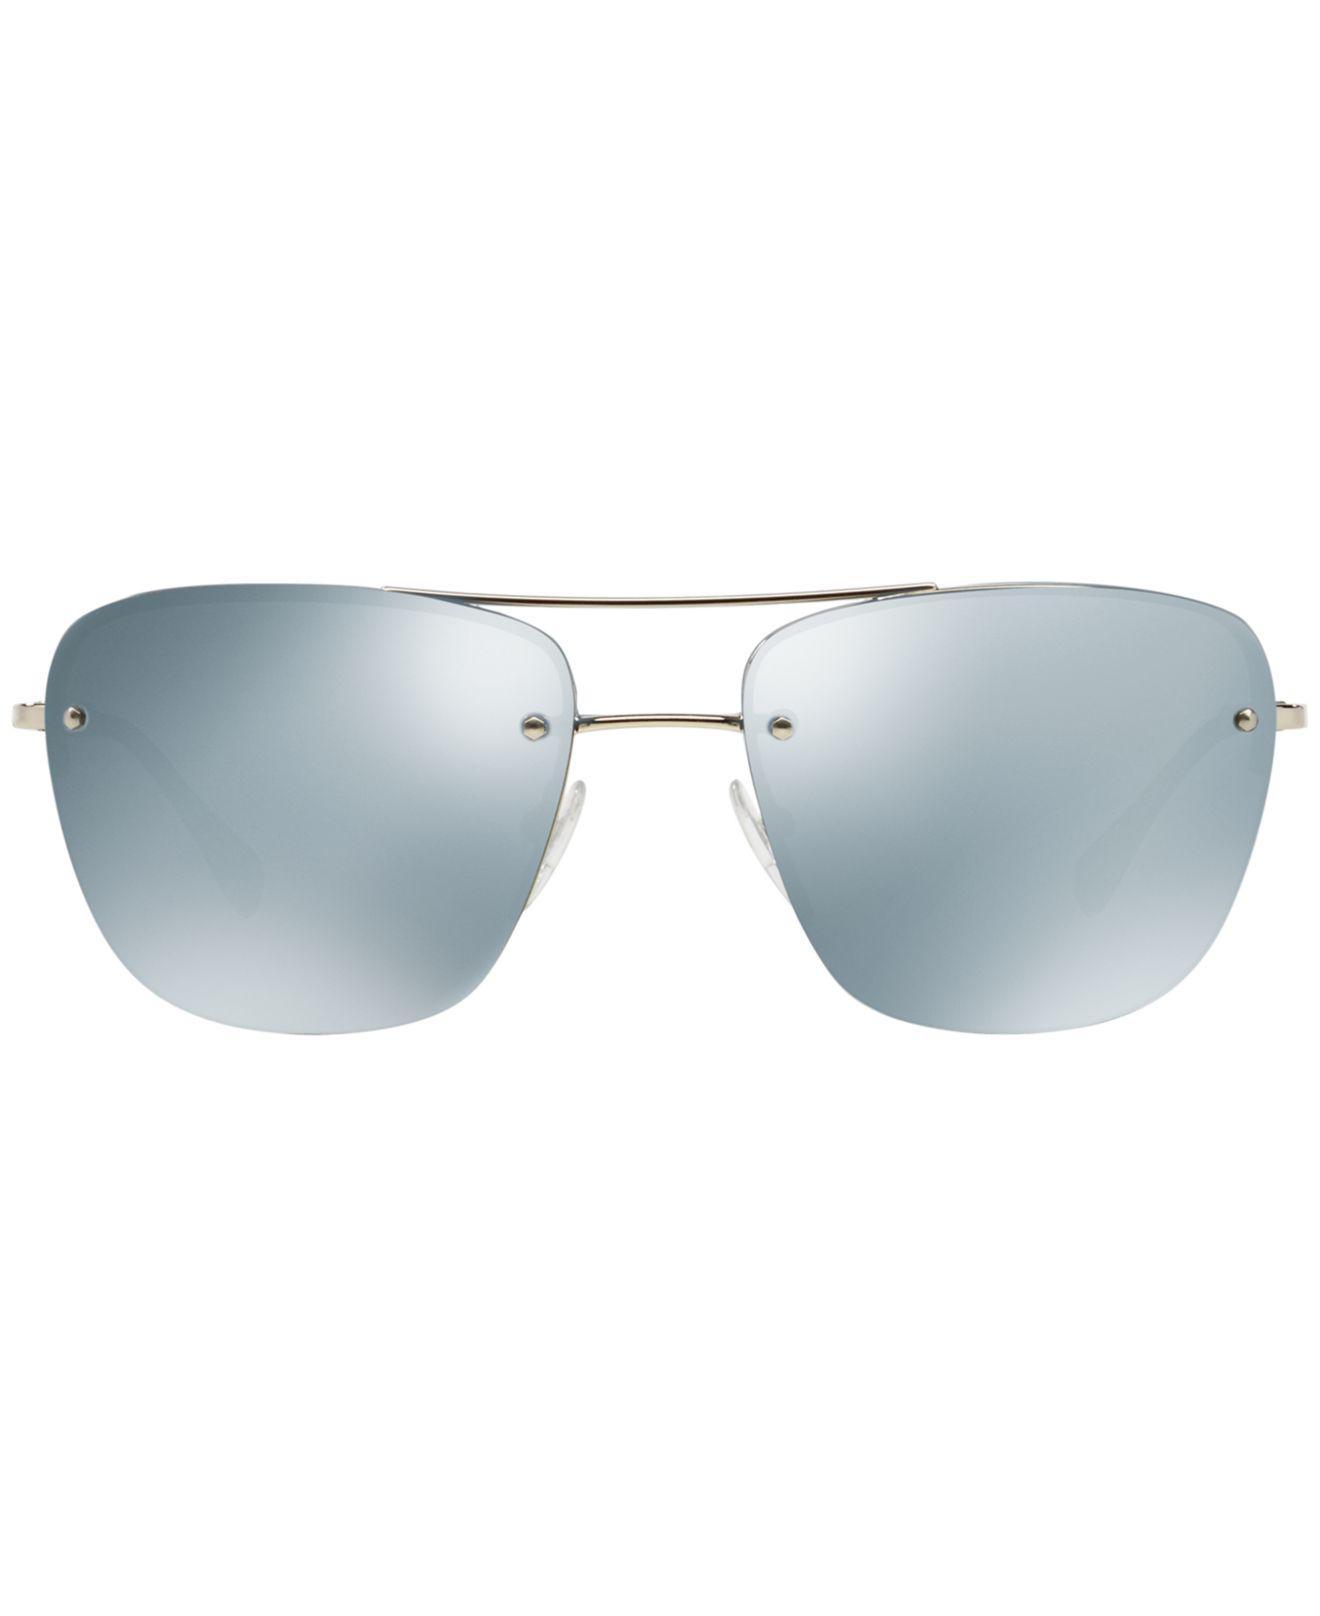 f72d1c1f120 ... greece lyst prada sunglasses ps 52rs in metallic for men ede4b b5627